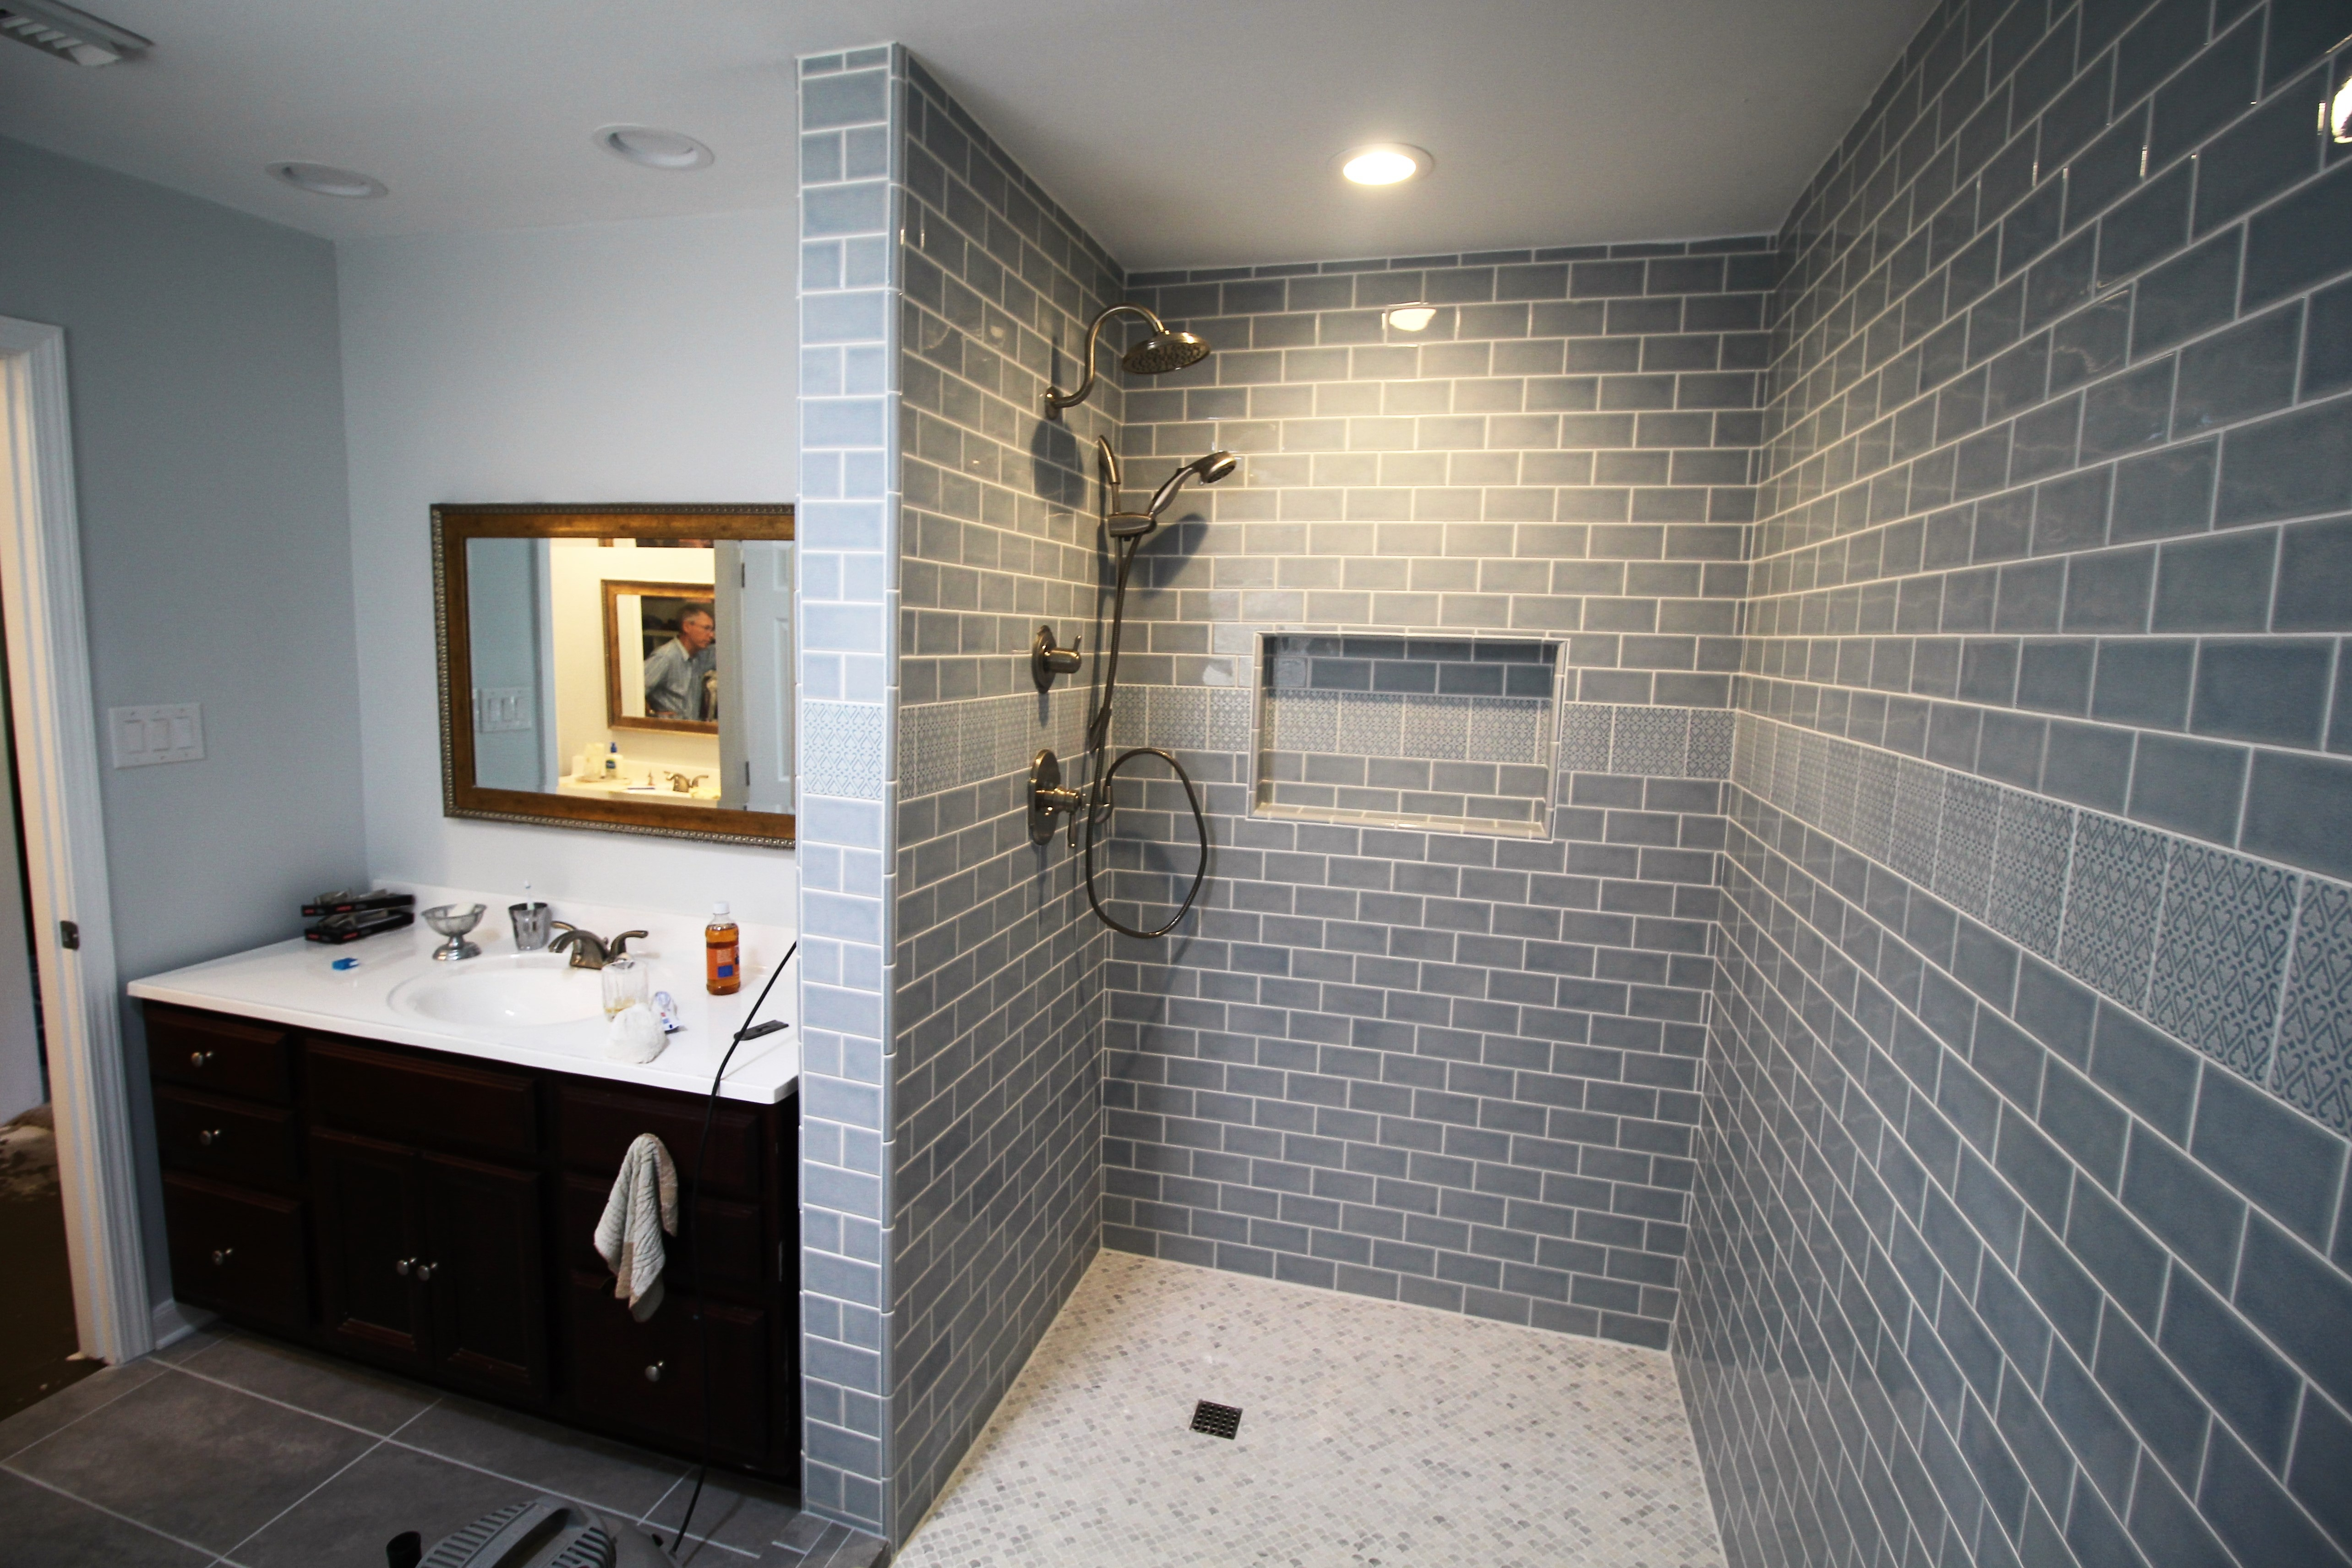 https://0201.nccdn.net/1_2/000/000/0f0/9c4/BathroomShowerAndSink-5135x3423.jpg